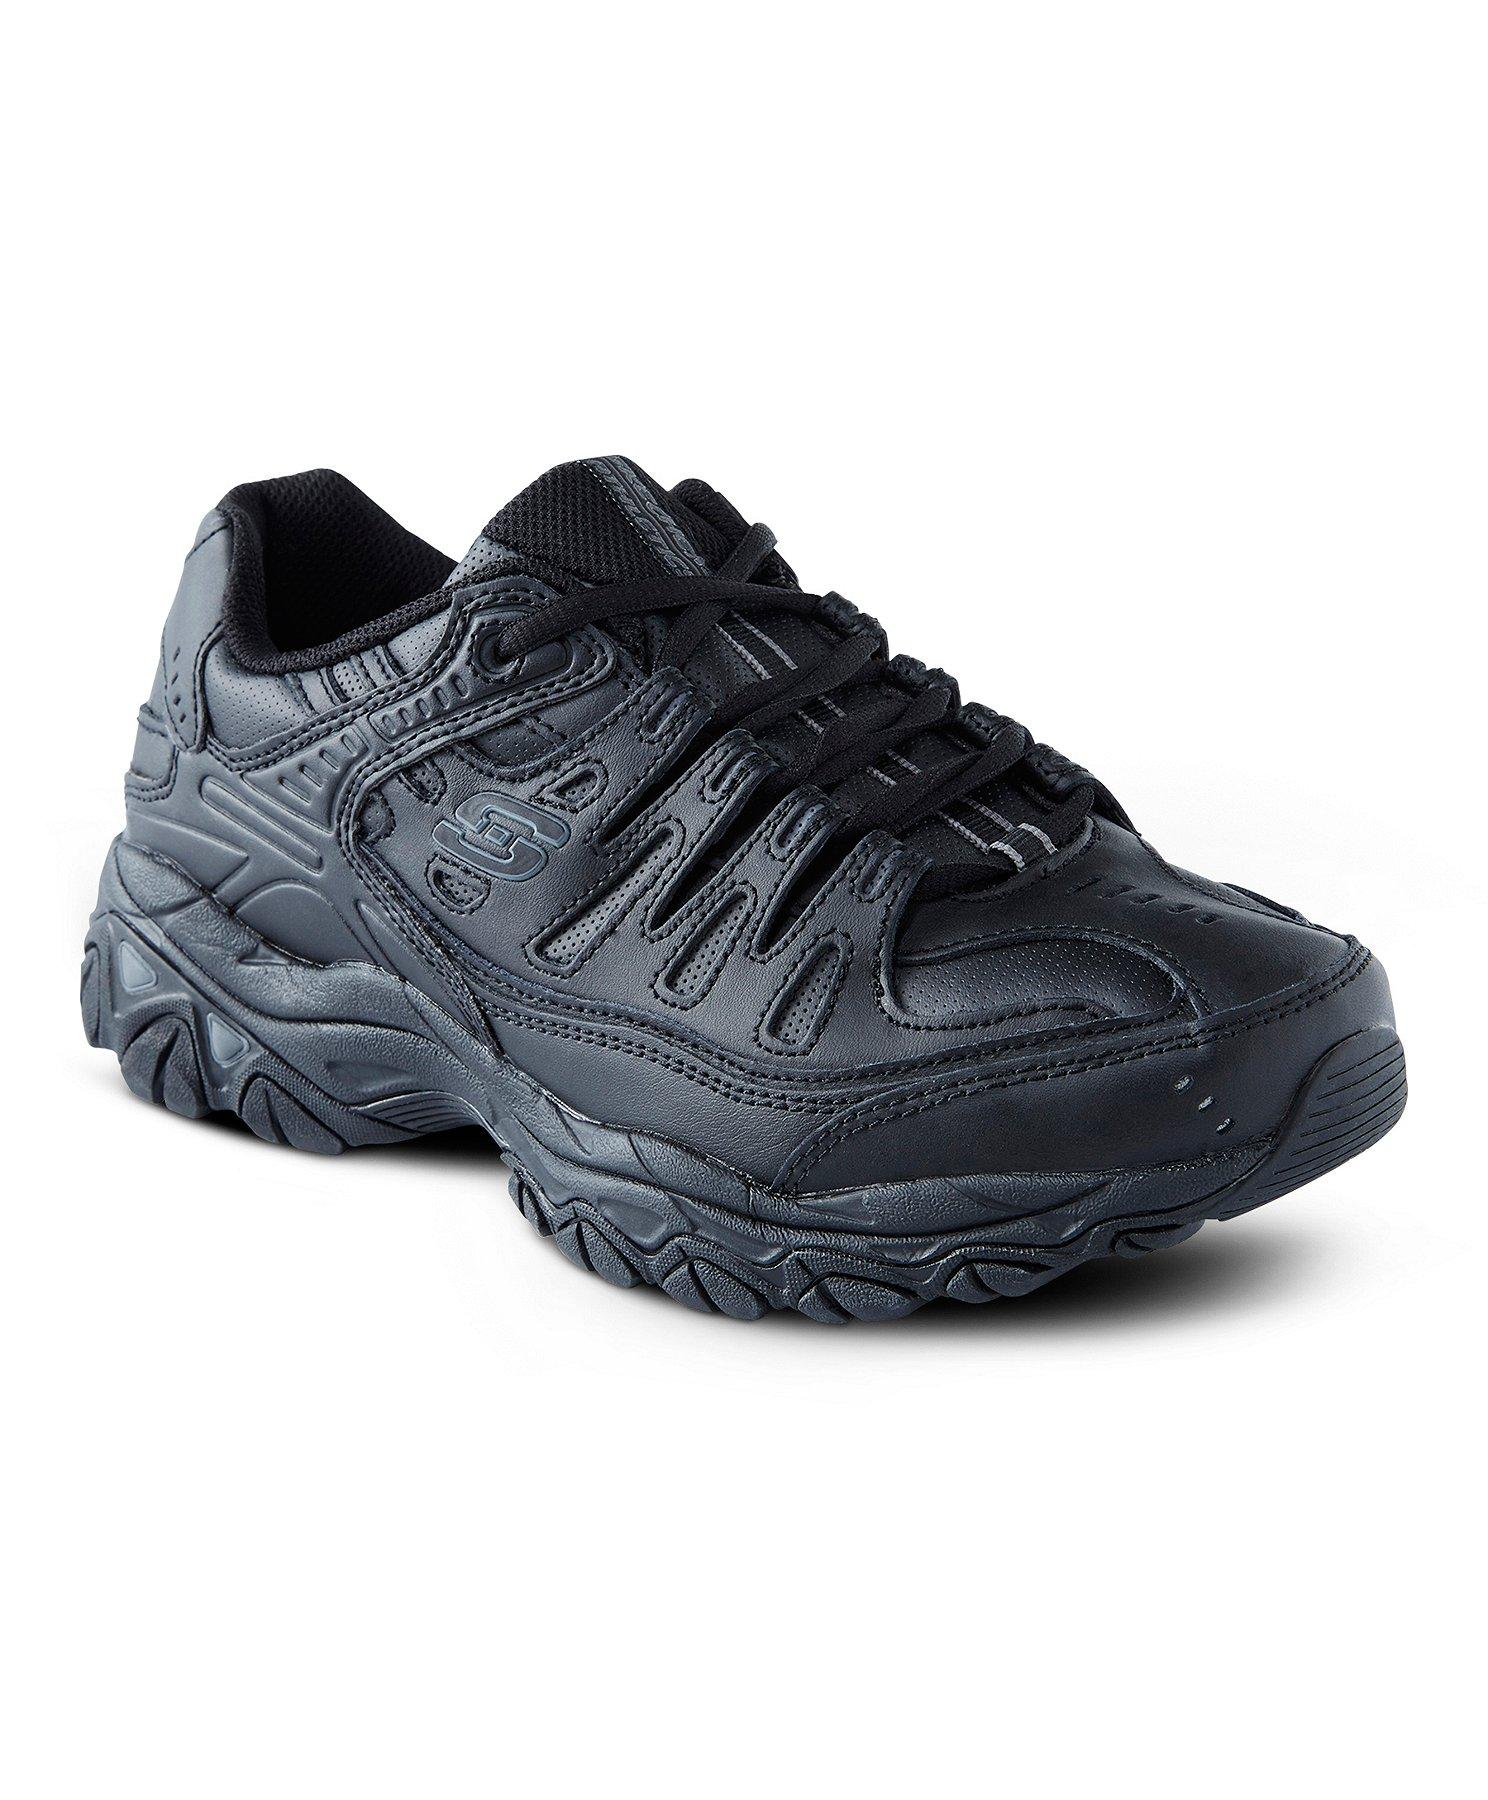 super popular top-rated newest original Men's After Burn Shoes - Wide